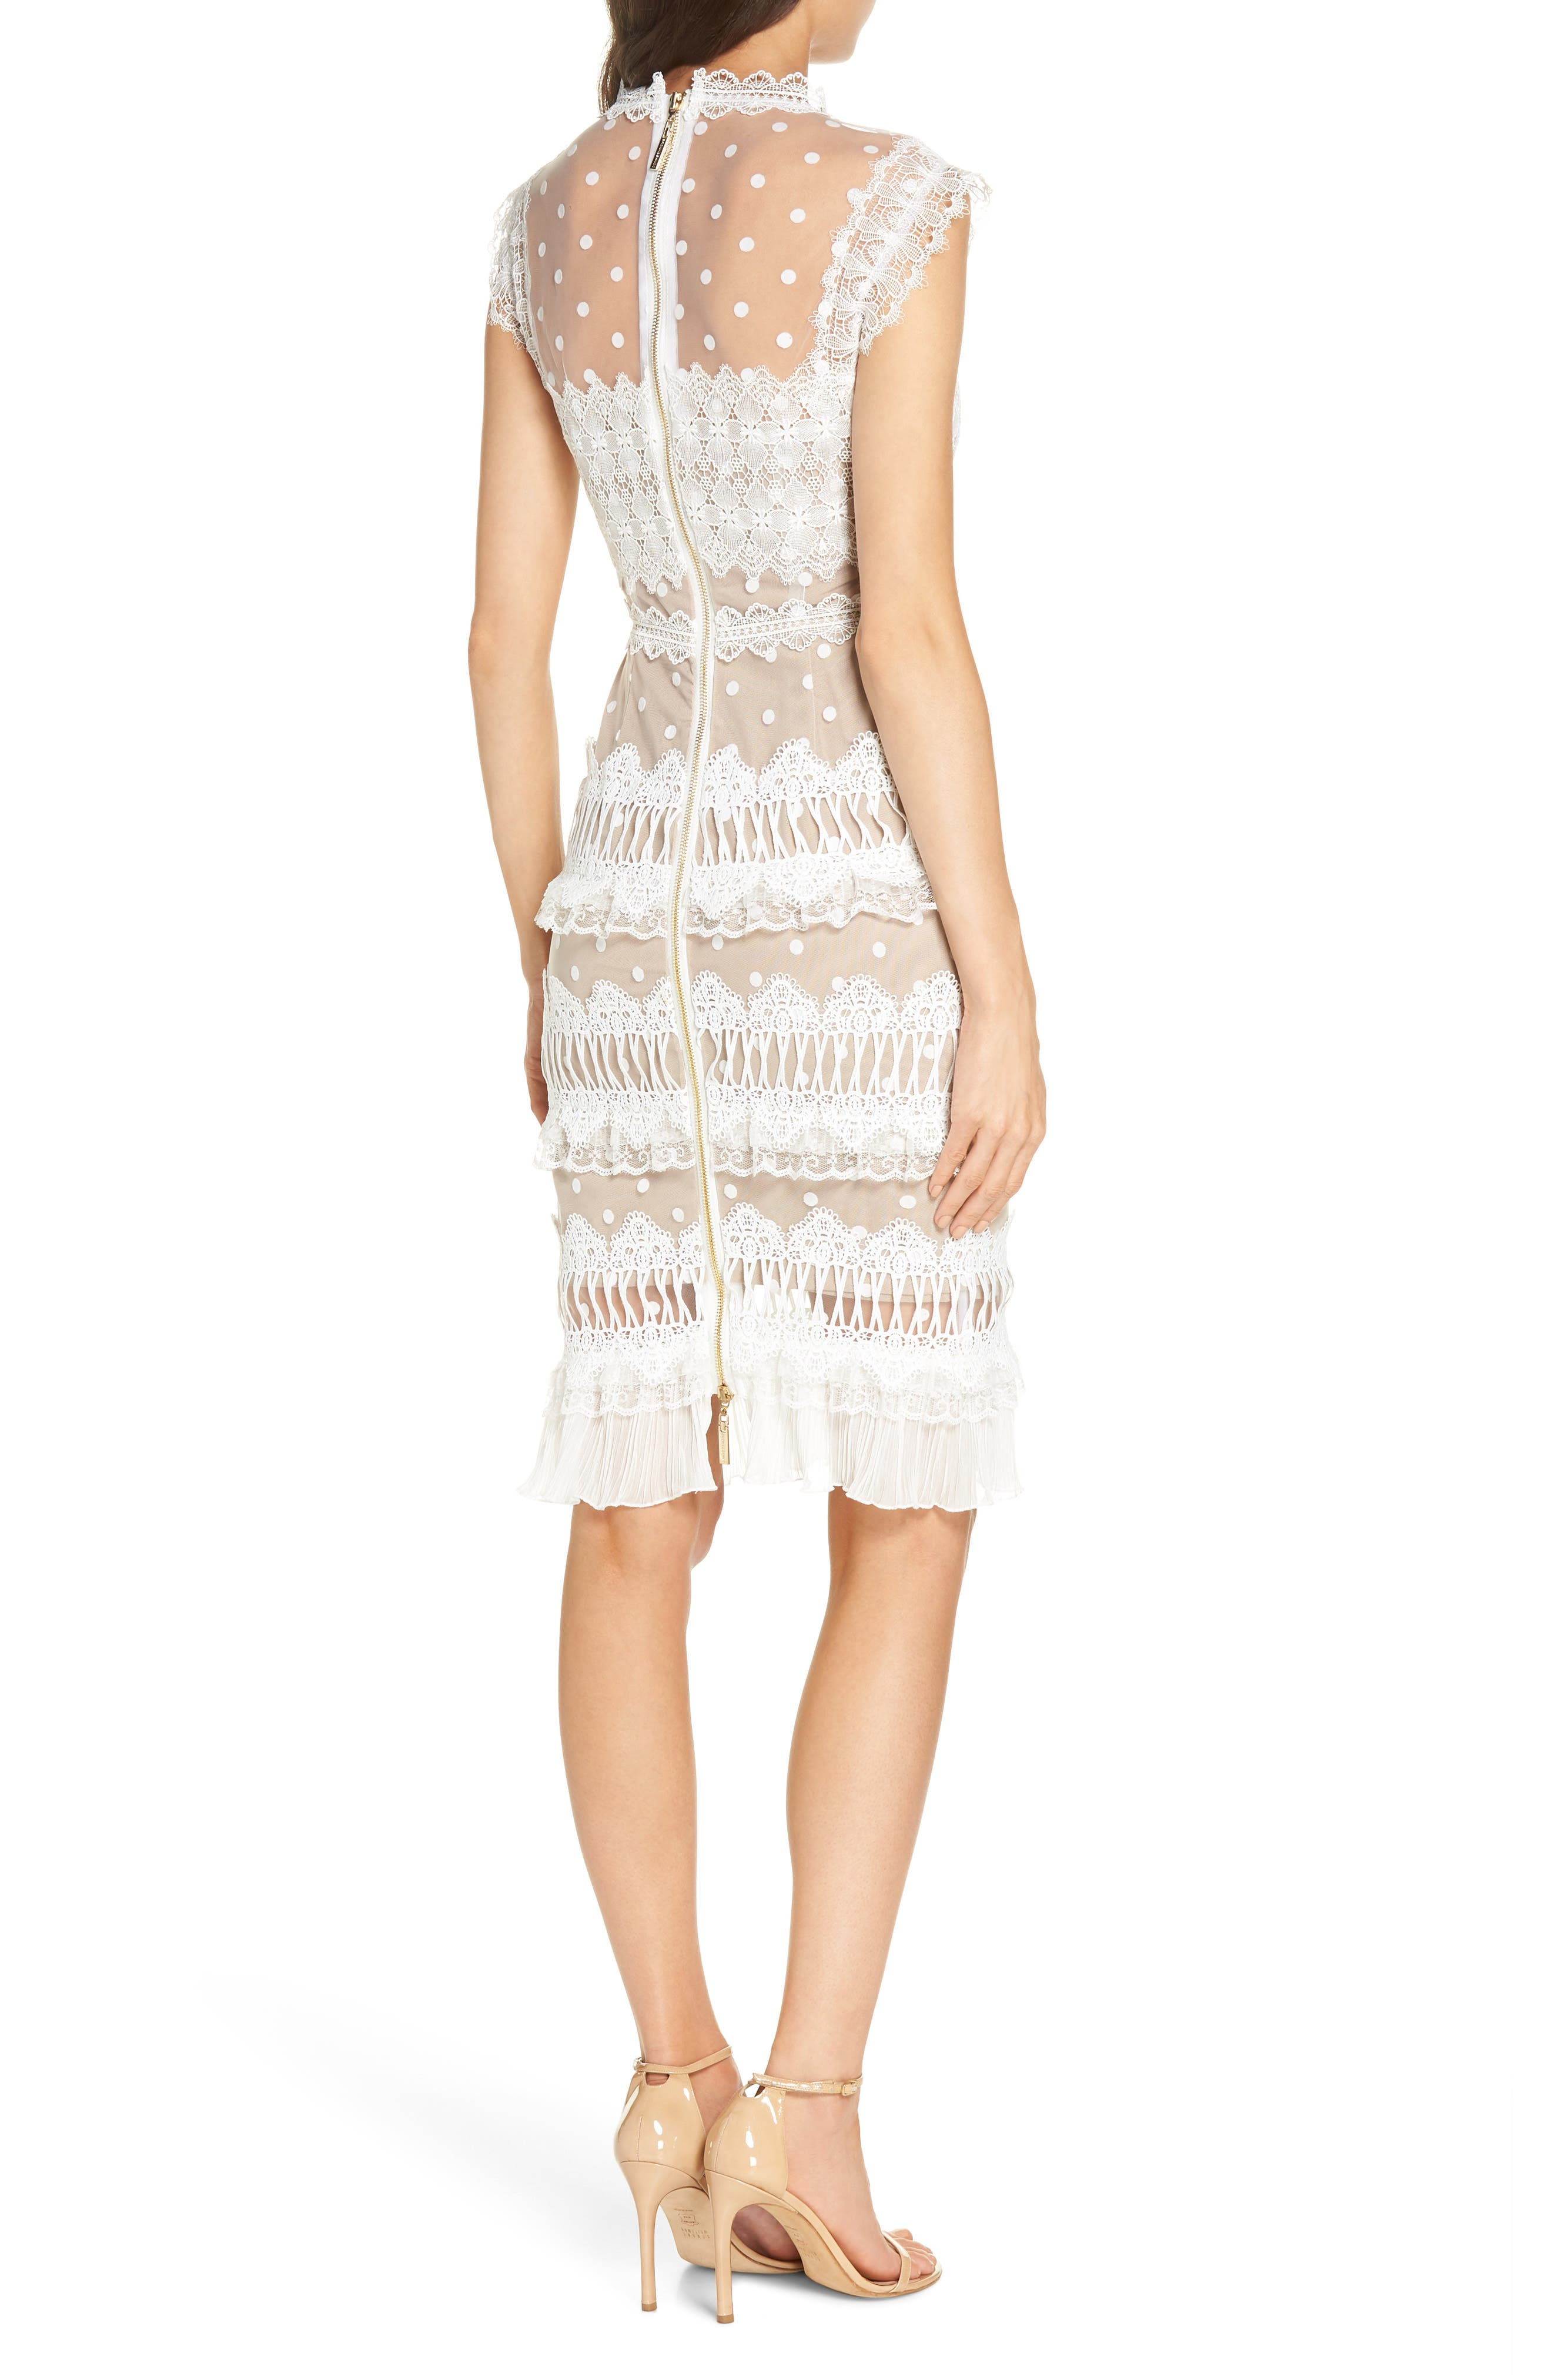 Majiorca Dot Lace Cocktail Dress,                             Alternate thumbnail 2, color,                             WHITE